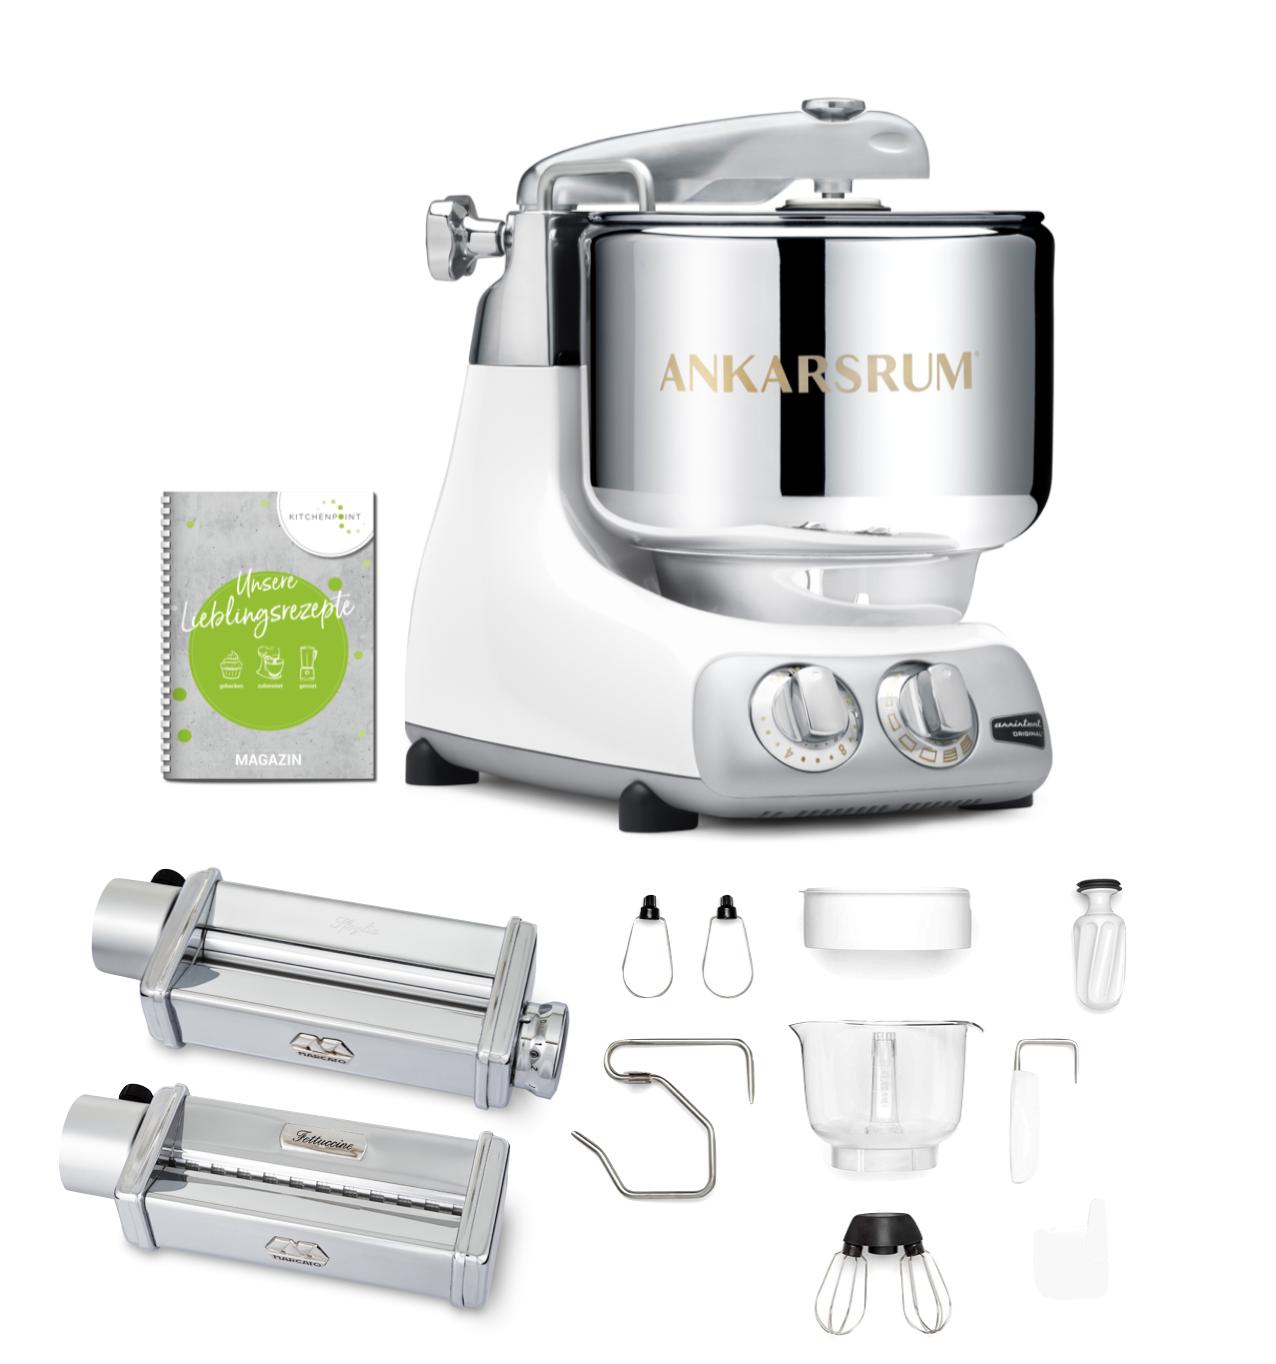 Ankarsrum Küchenmaschine Assistent Glossy White - Pasta Set